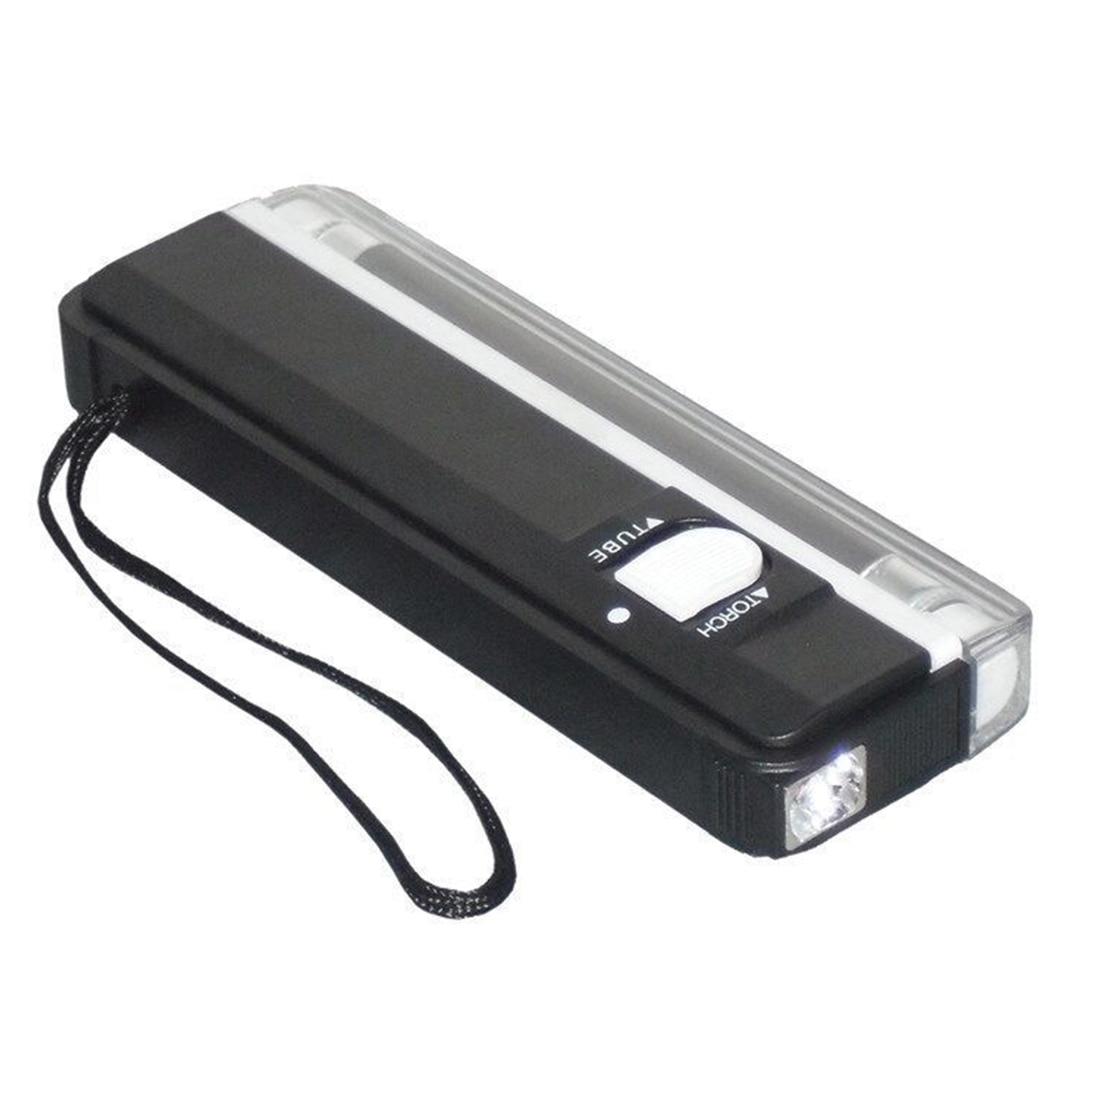 2 in 1 Detector Money Portable Checker UV Handheld Purple Light Tester Torch